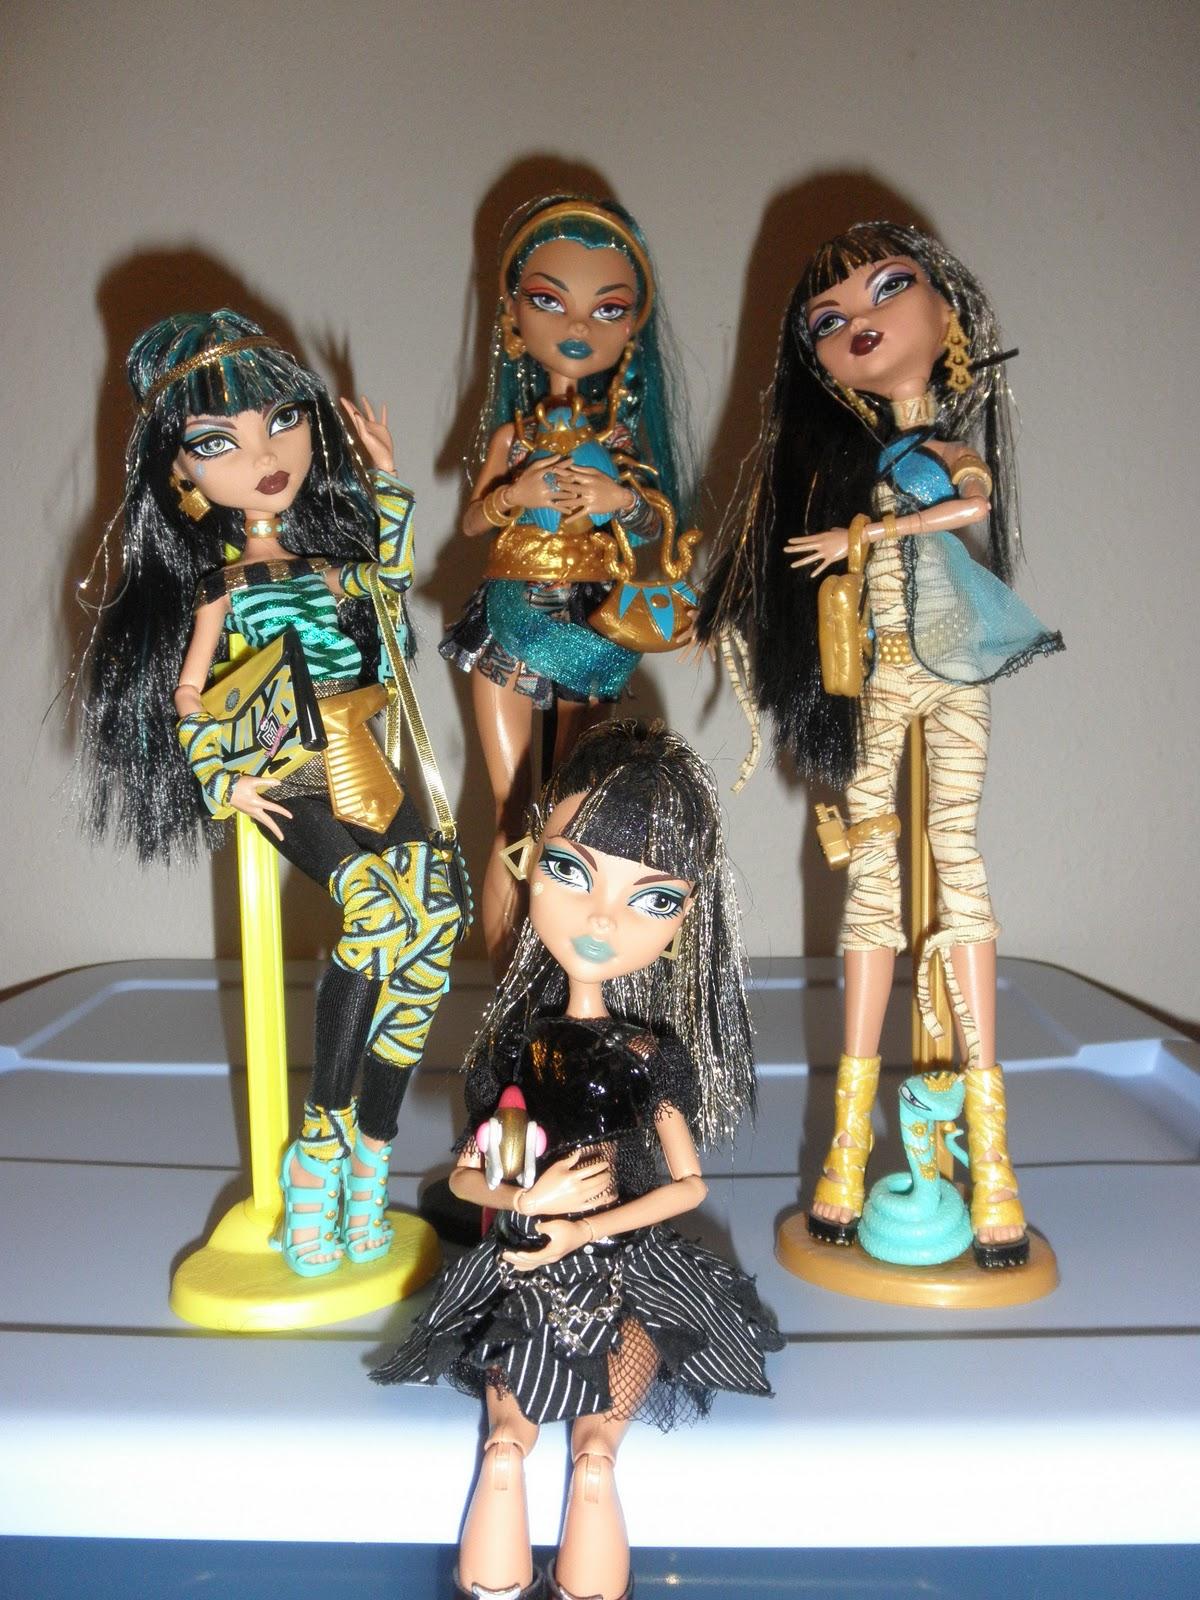 jupiter u0026 39 s closet  new monster high girls